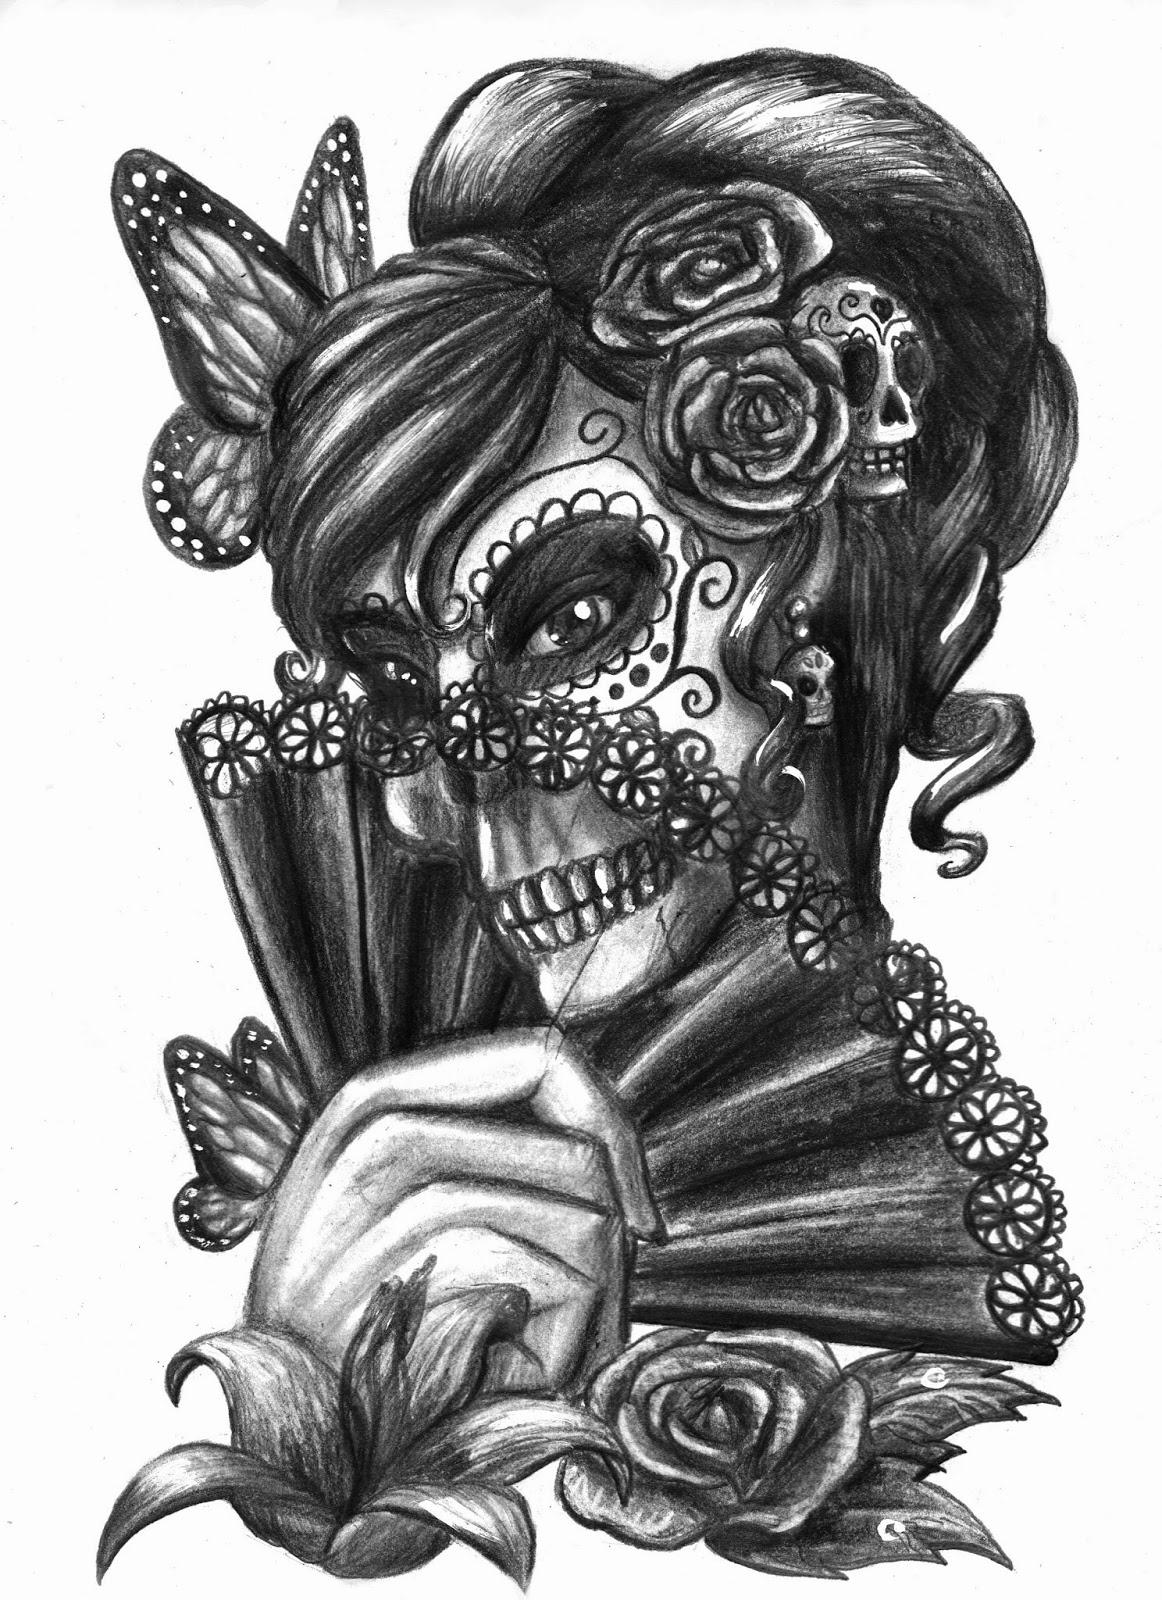 kate mcspadden 39 s animation and cartoons tattoo art t shirt design contest danza de la muerte. Black Bedroom Furniture Sets. Home Design Ideas